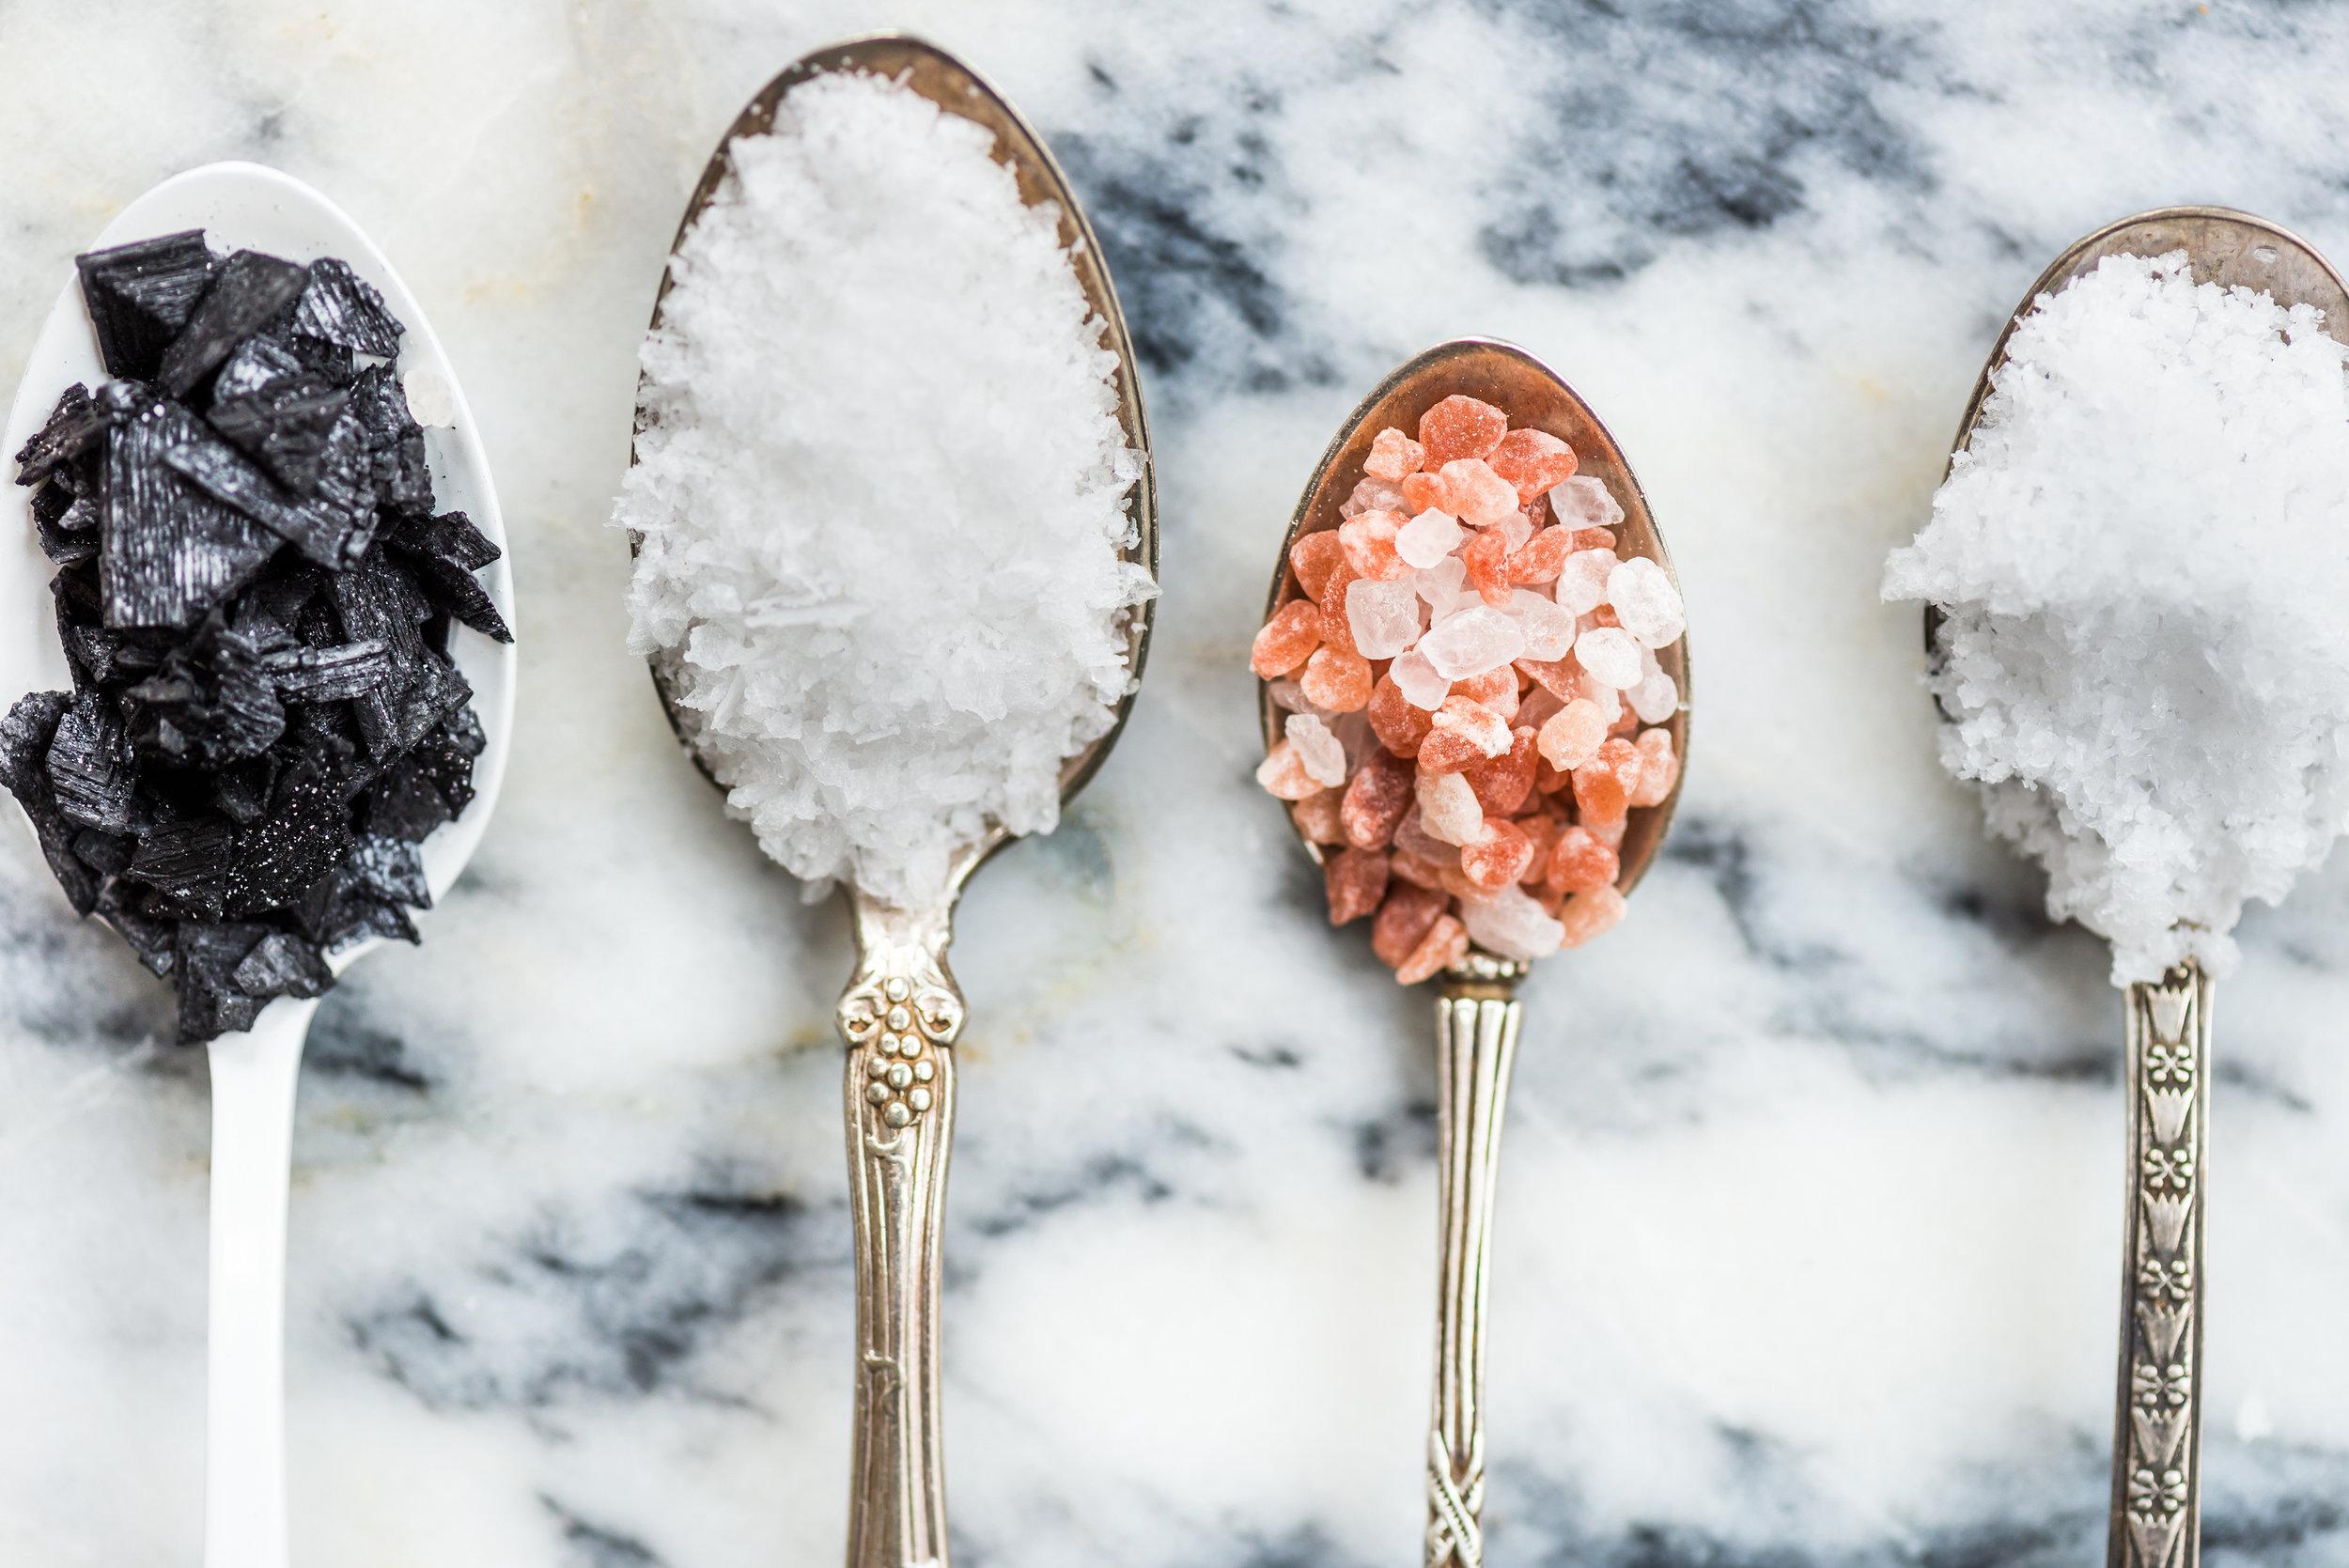 Salt (just normal table salt)